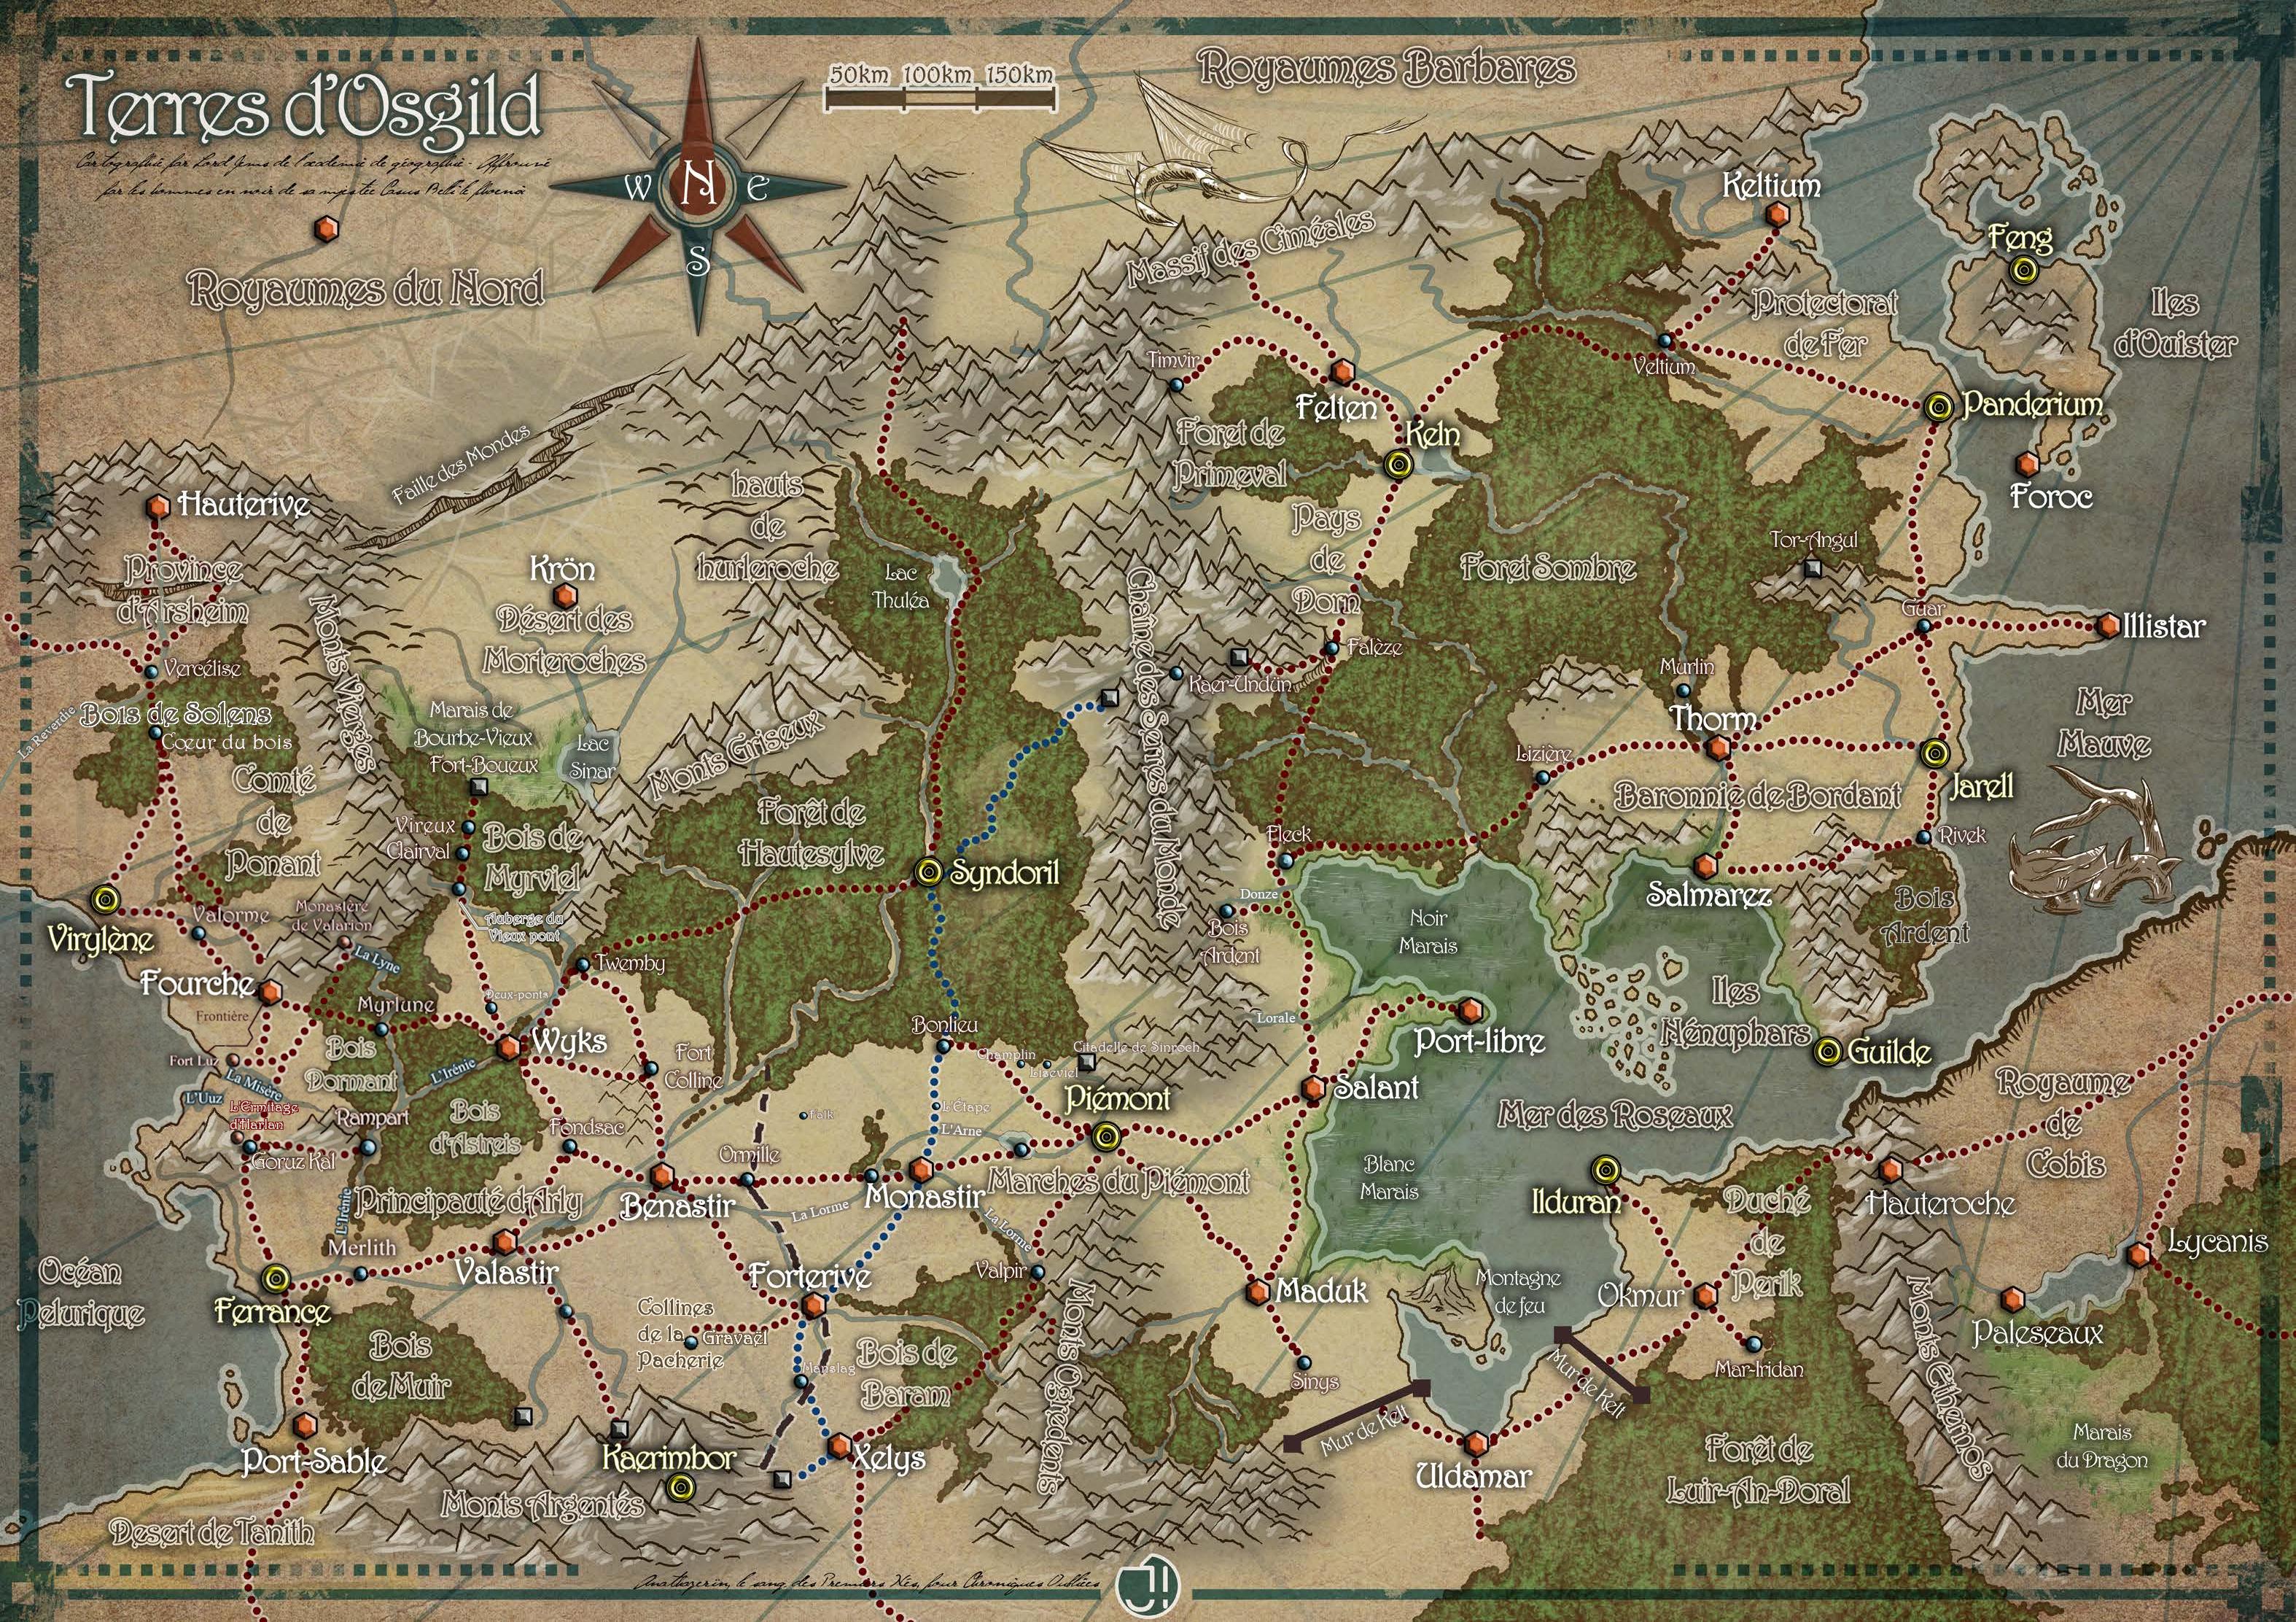 Terres d'Osgild